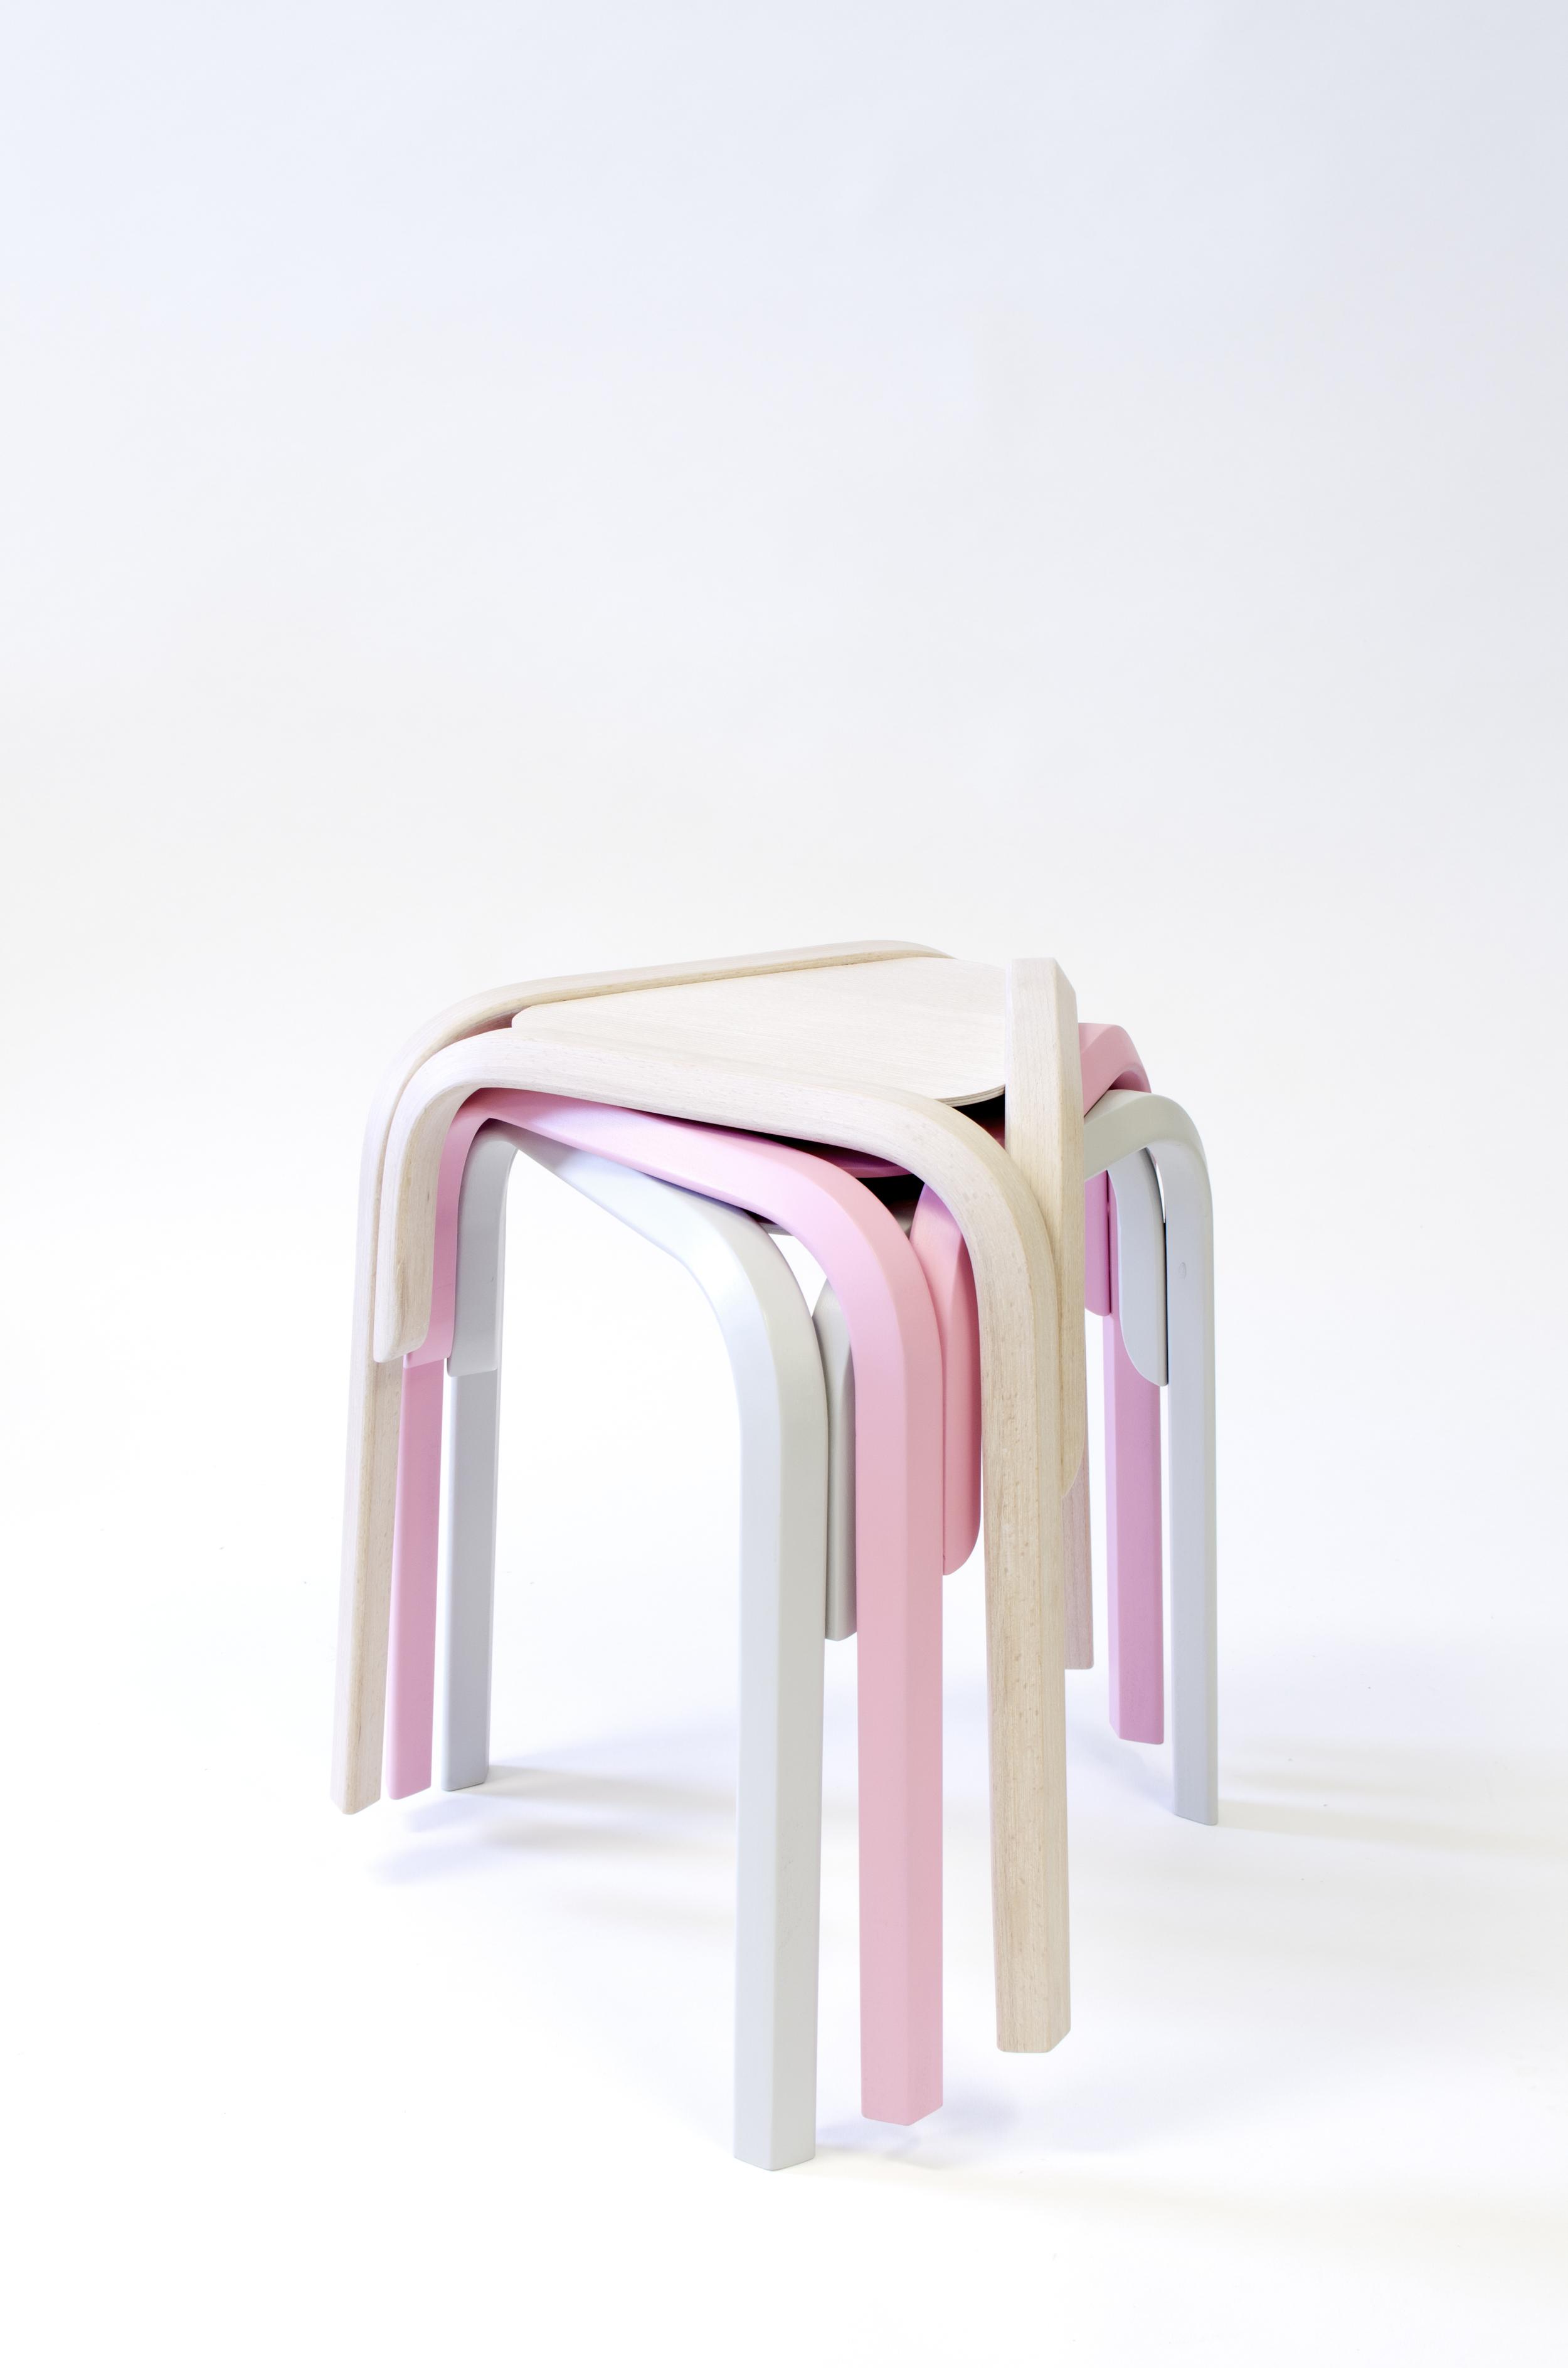 Project Gösta by Charlie Styrbjörn Nilsson (20).jpg